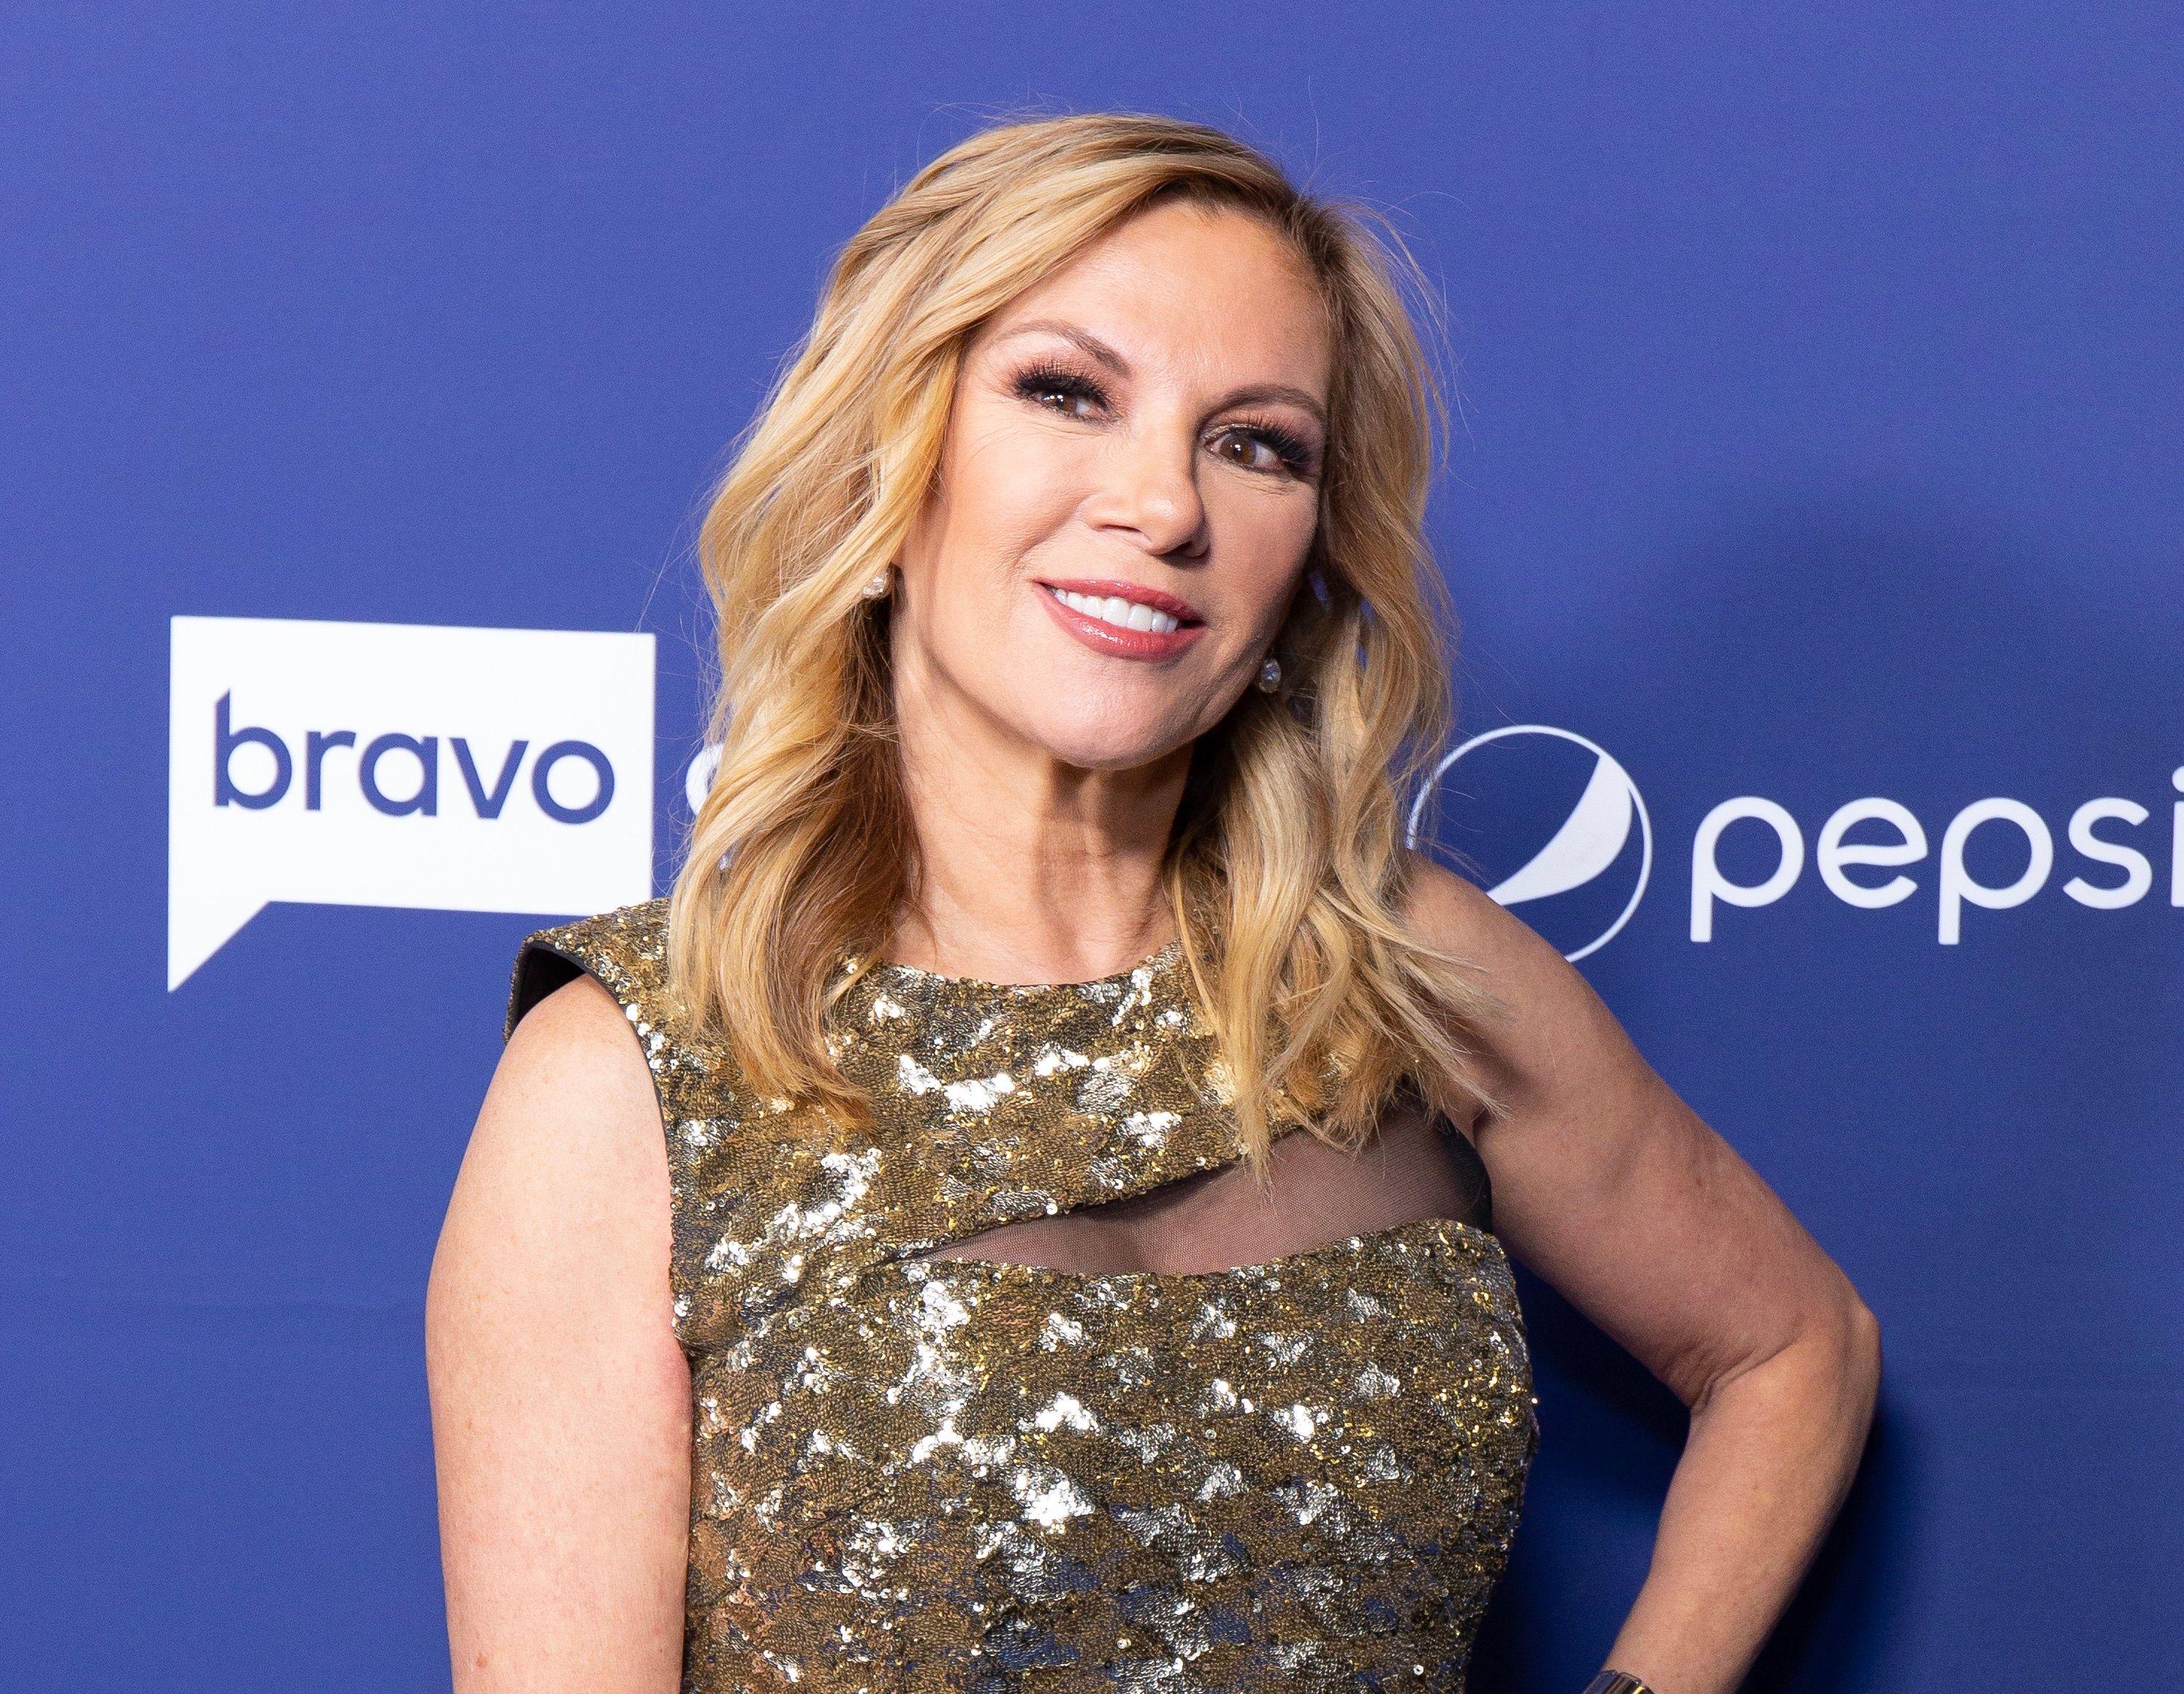 Ramona Singer at Bravo Con